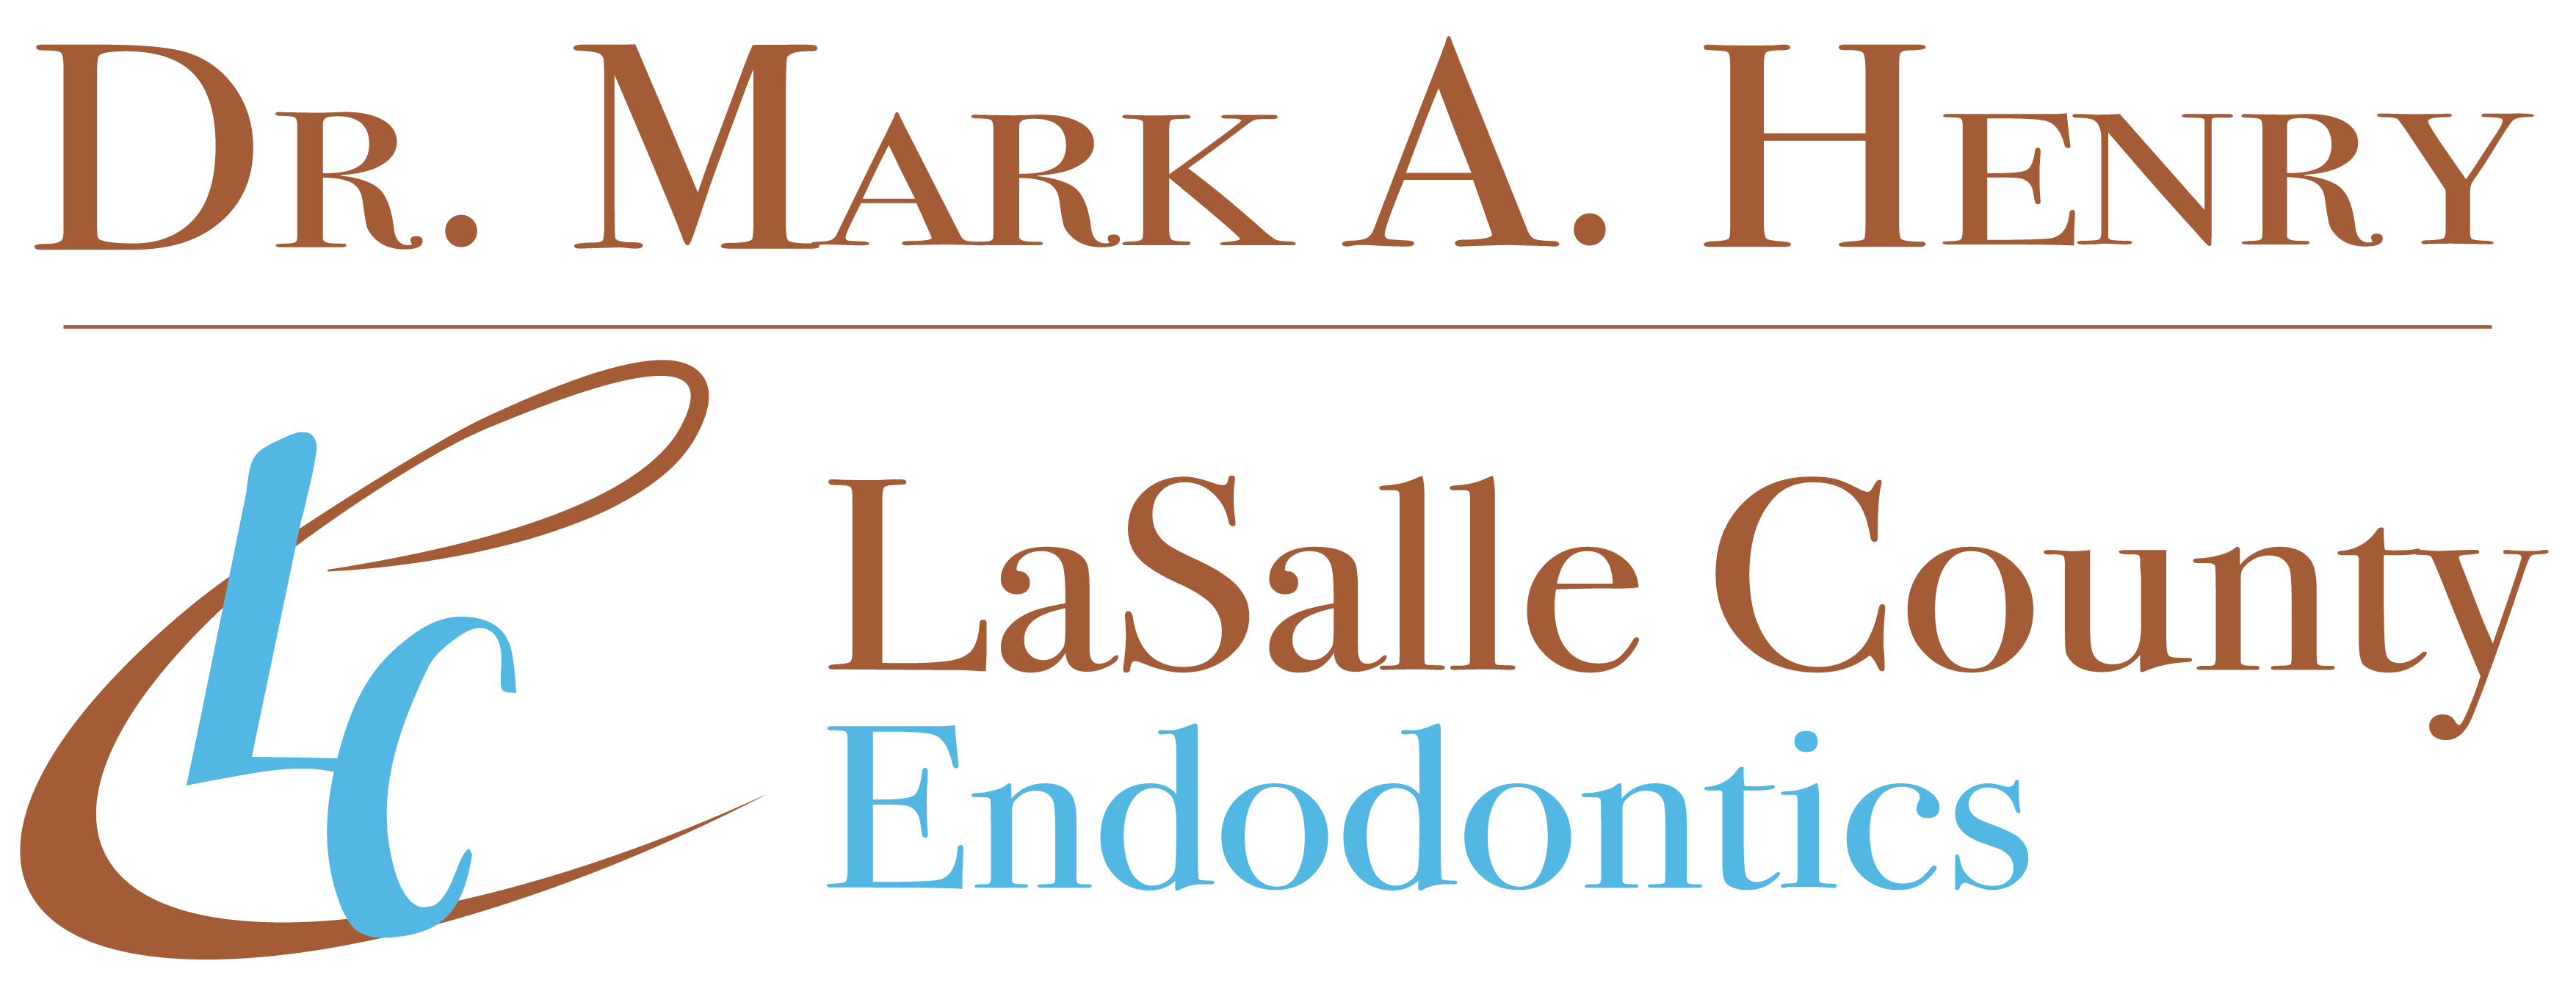 LaSalle County Endodontics Logo